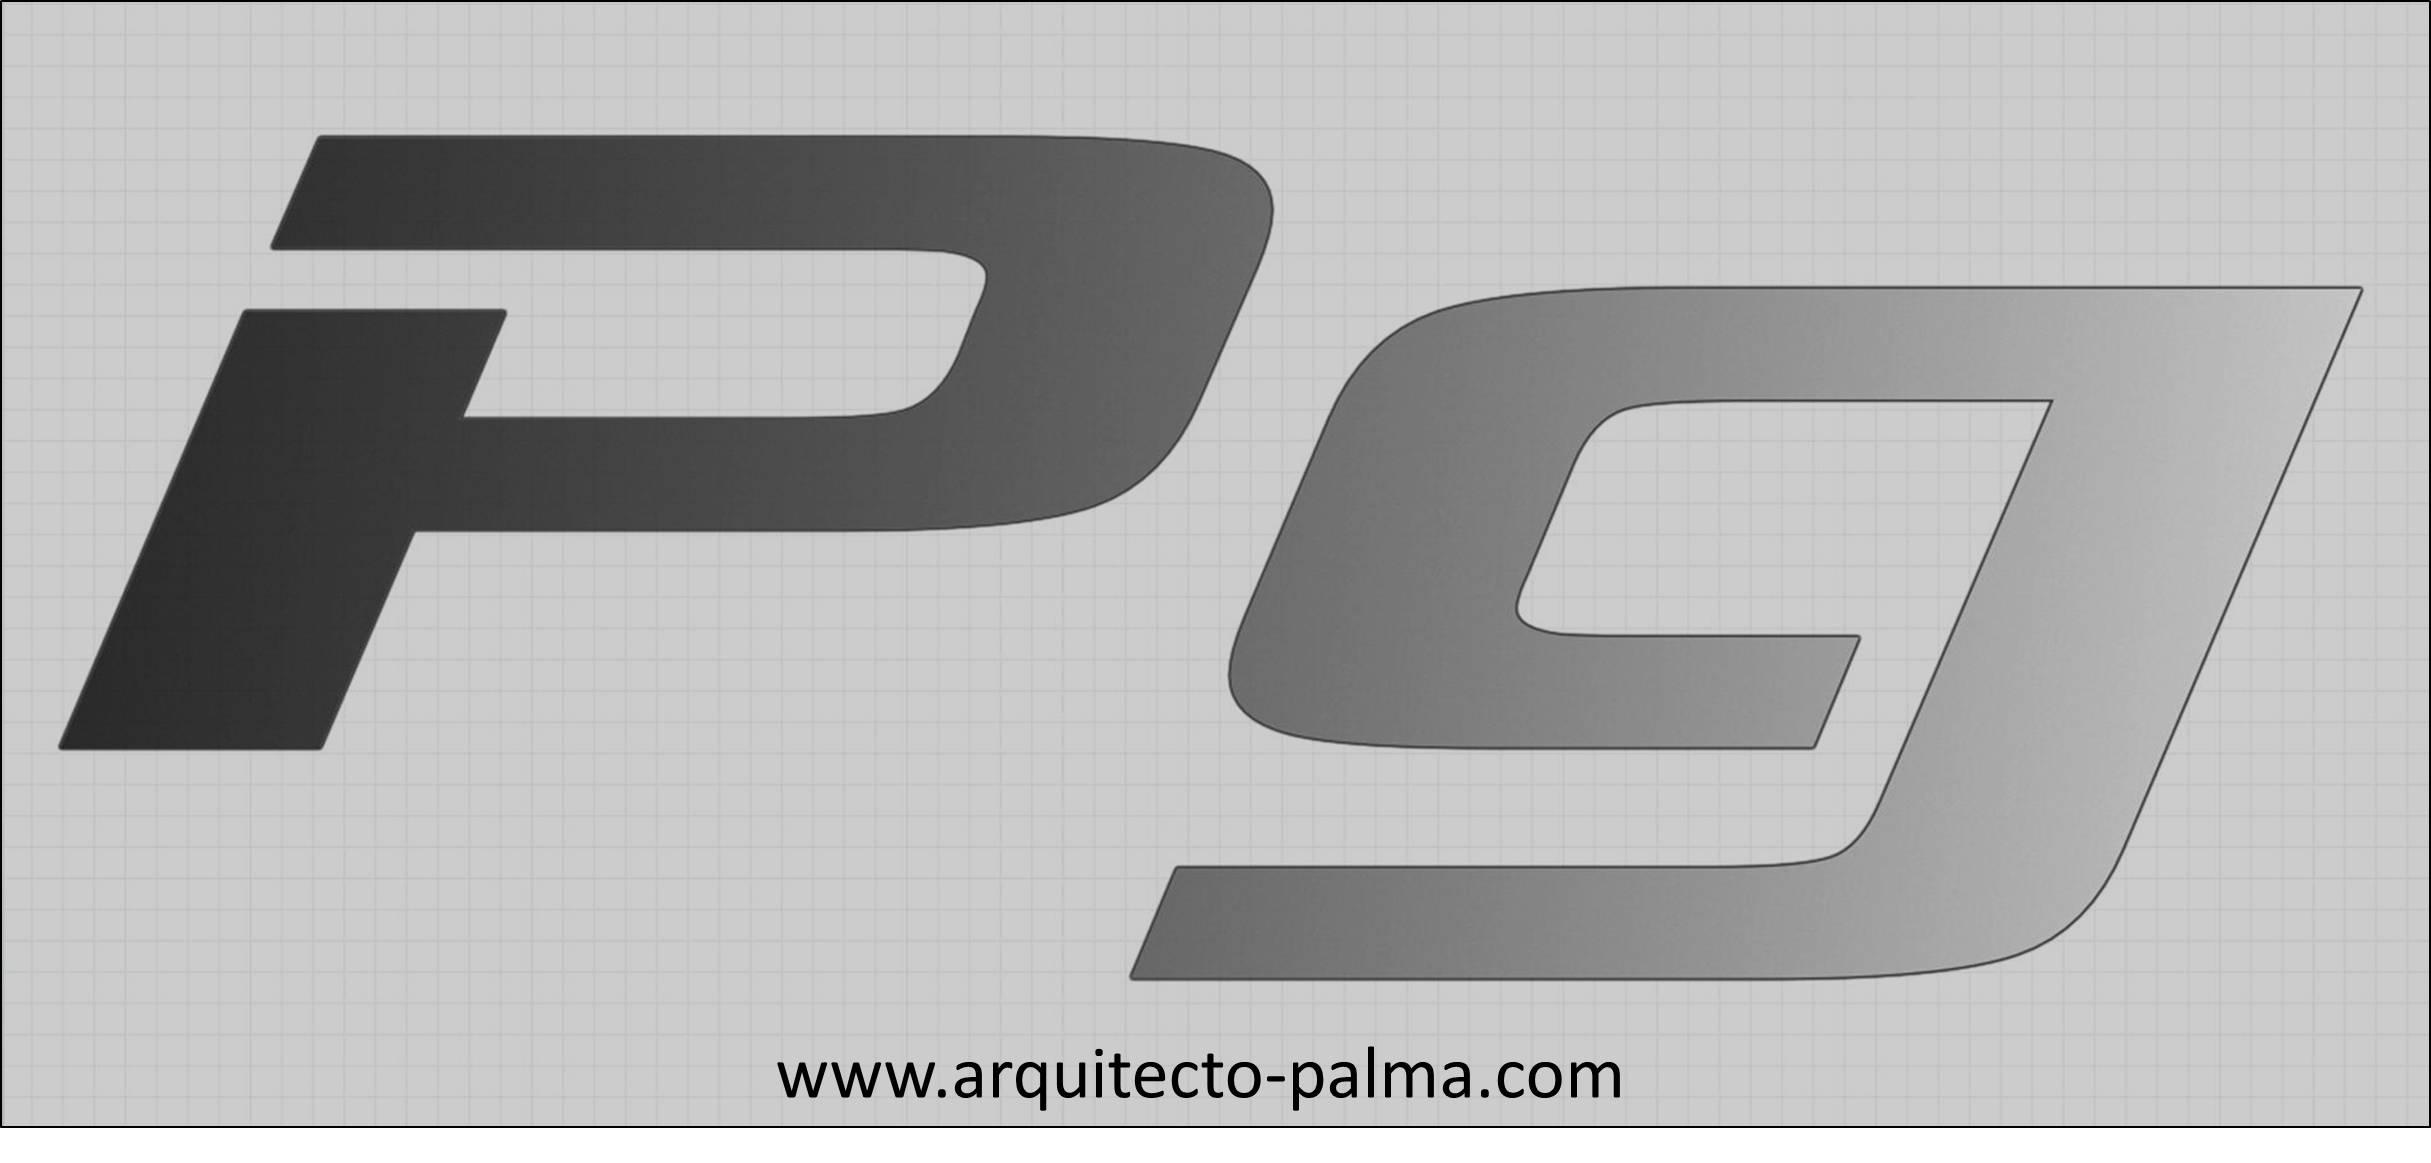 Arquitecto-palma